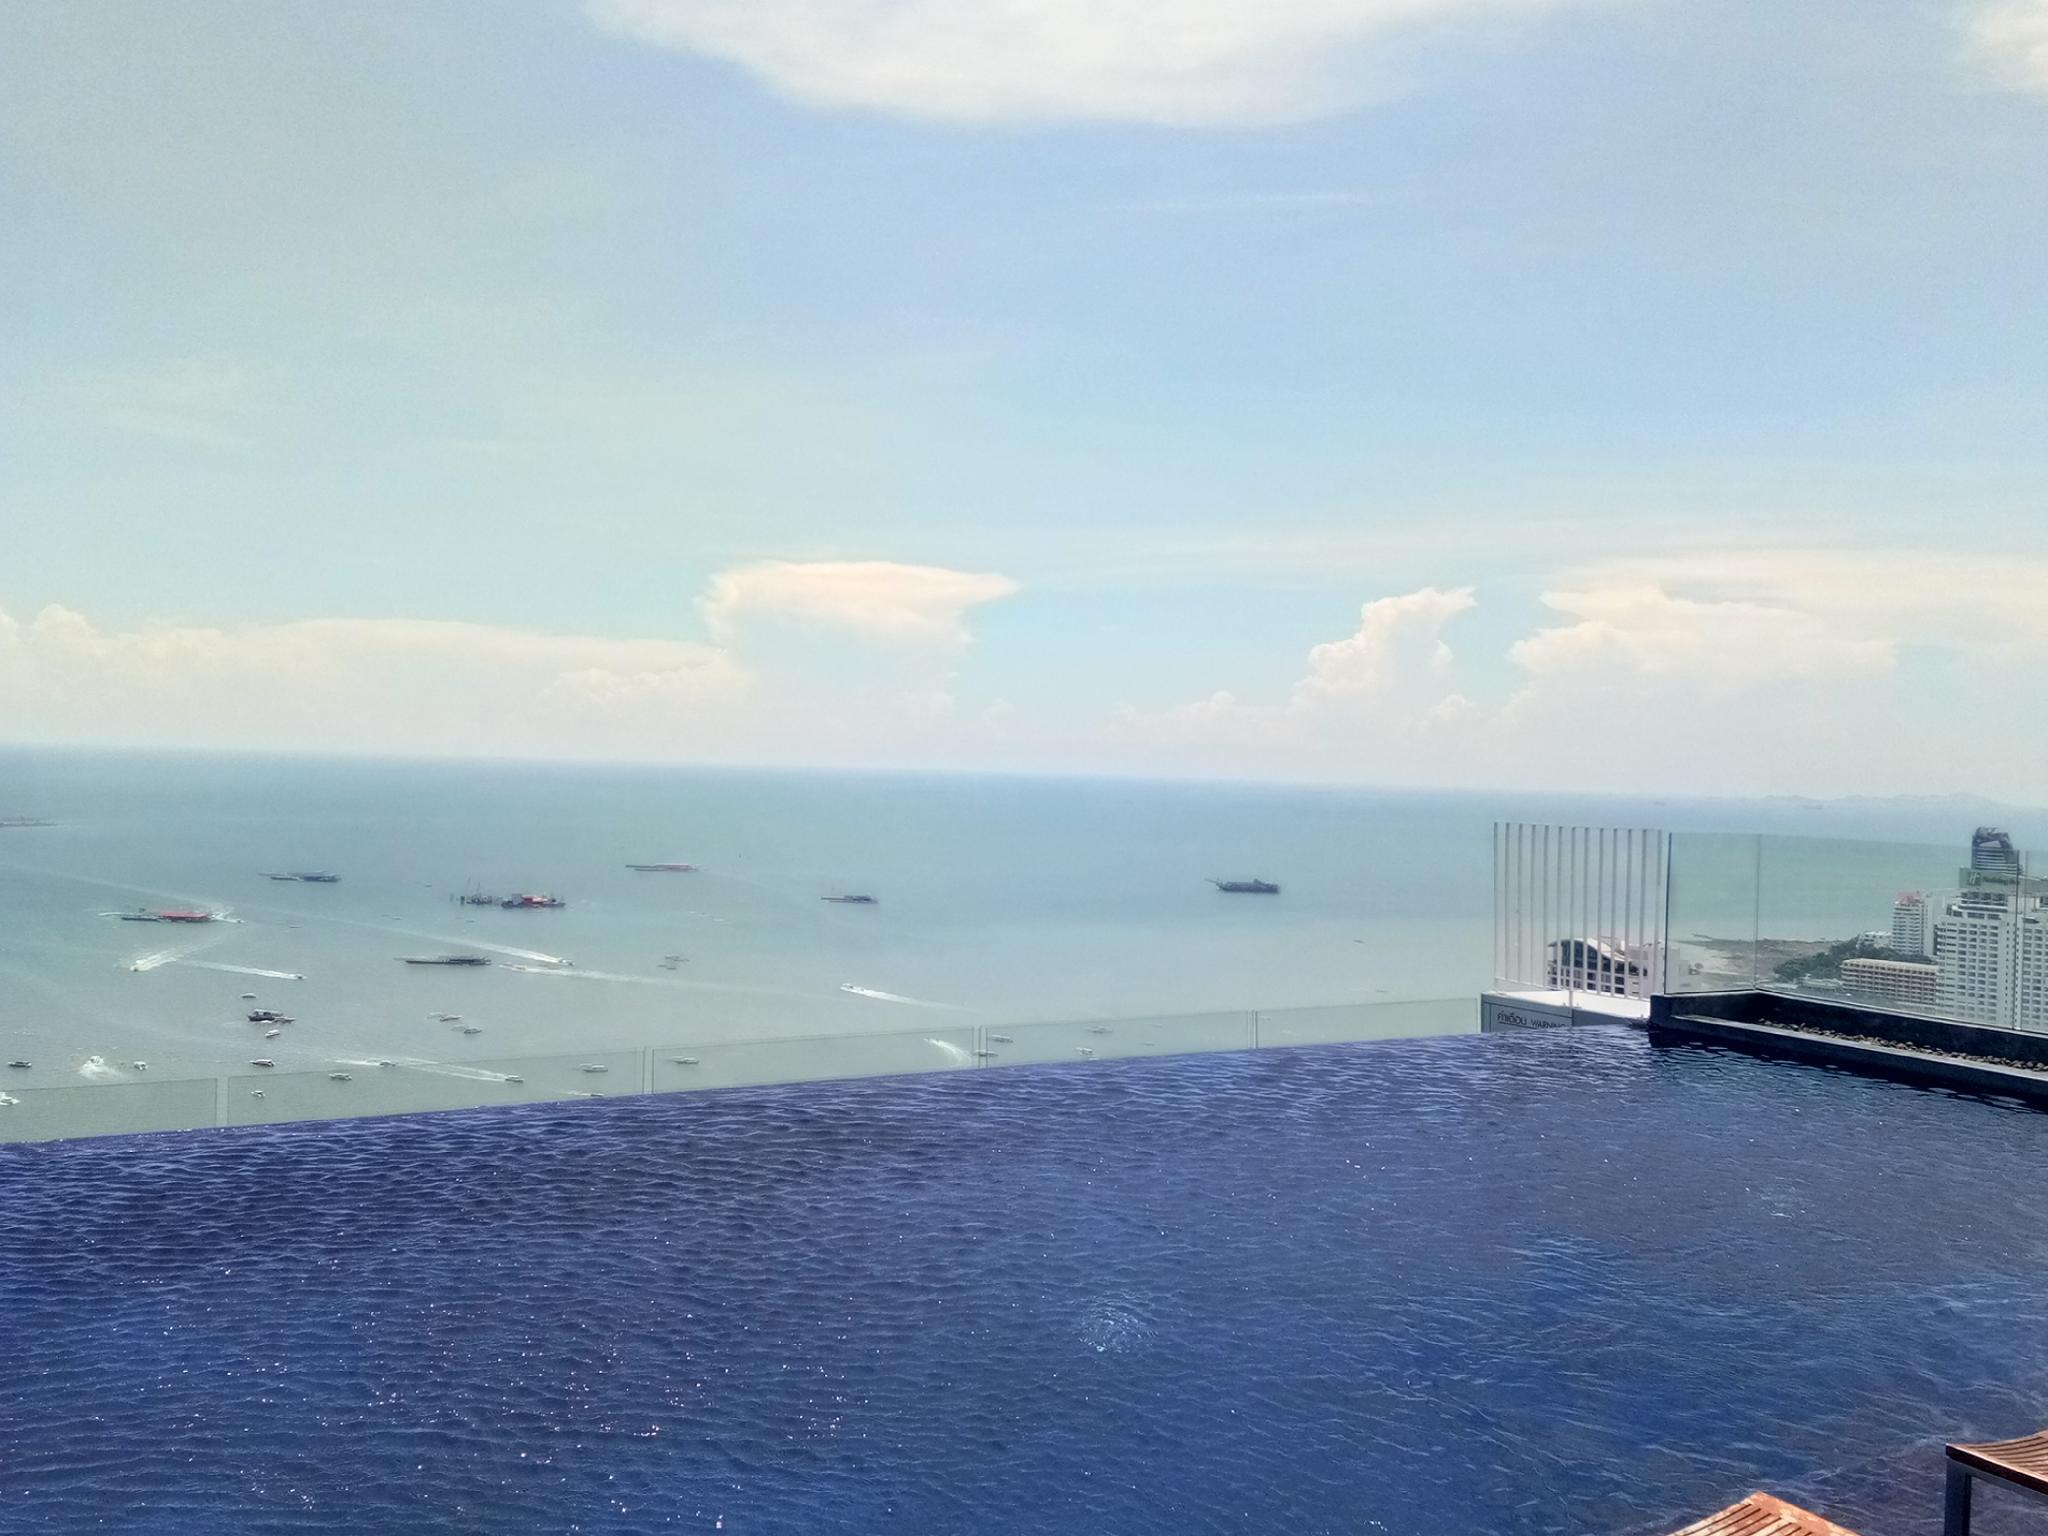 Centric Sea Condo #Pattaya Central Centric Sea Condo #Pattaya Central